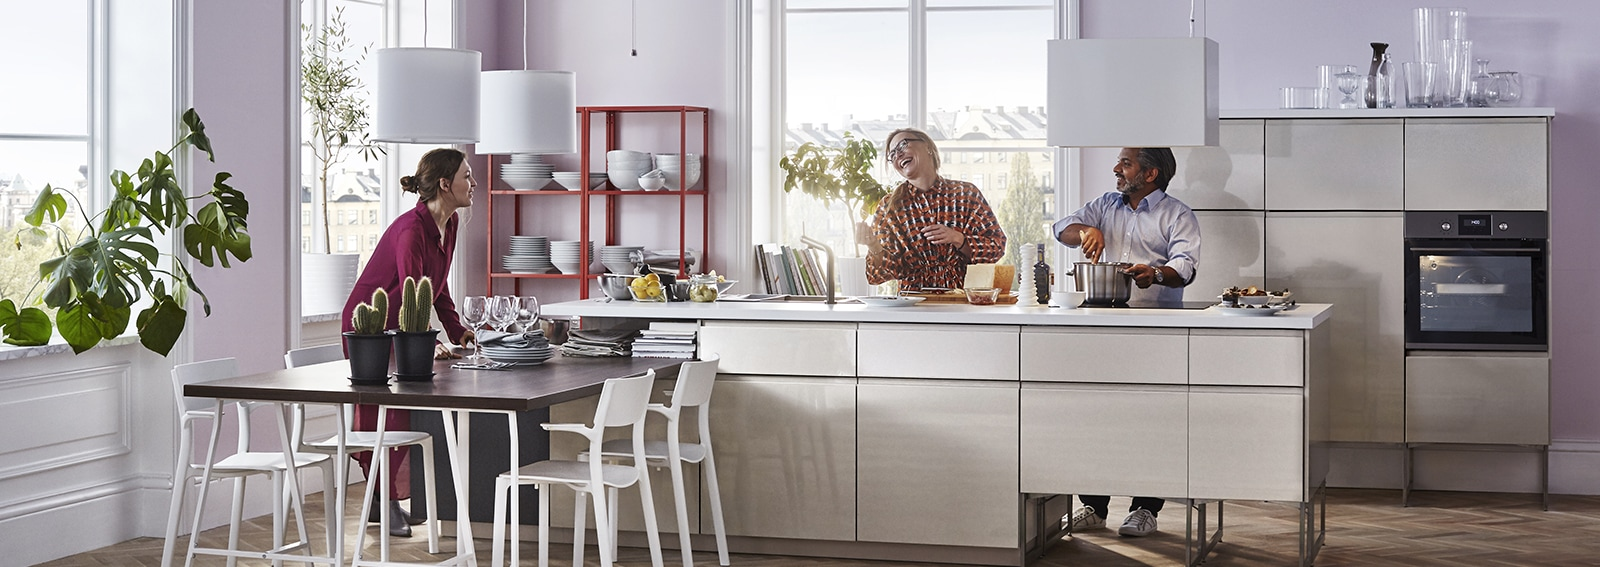 Cucine In Acciaio Ikea. Trendy Cucina Acciaio Ikea Canebook ...